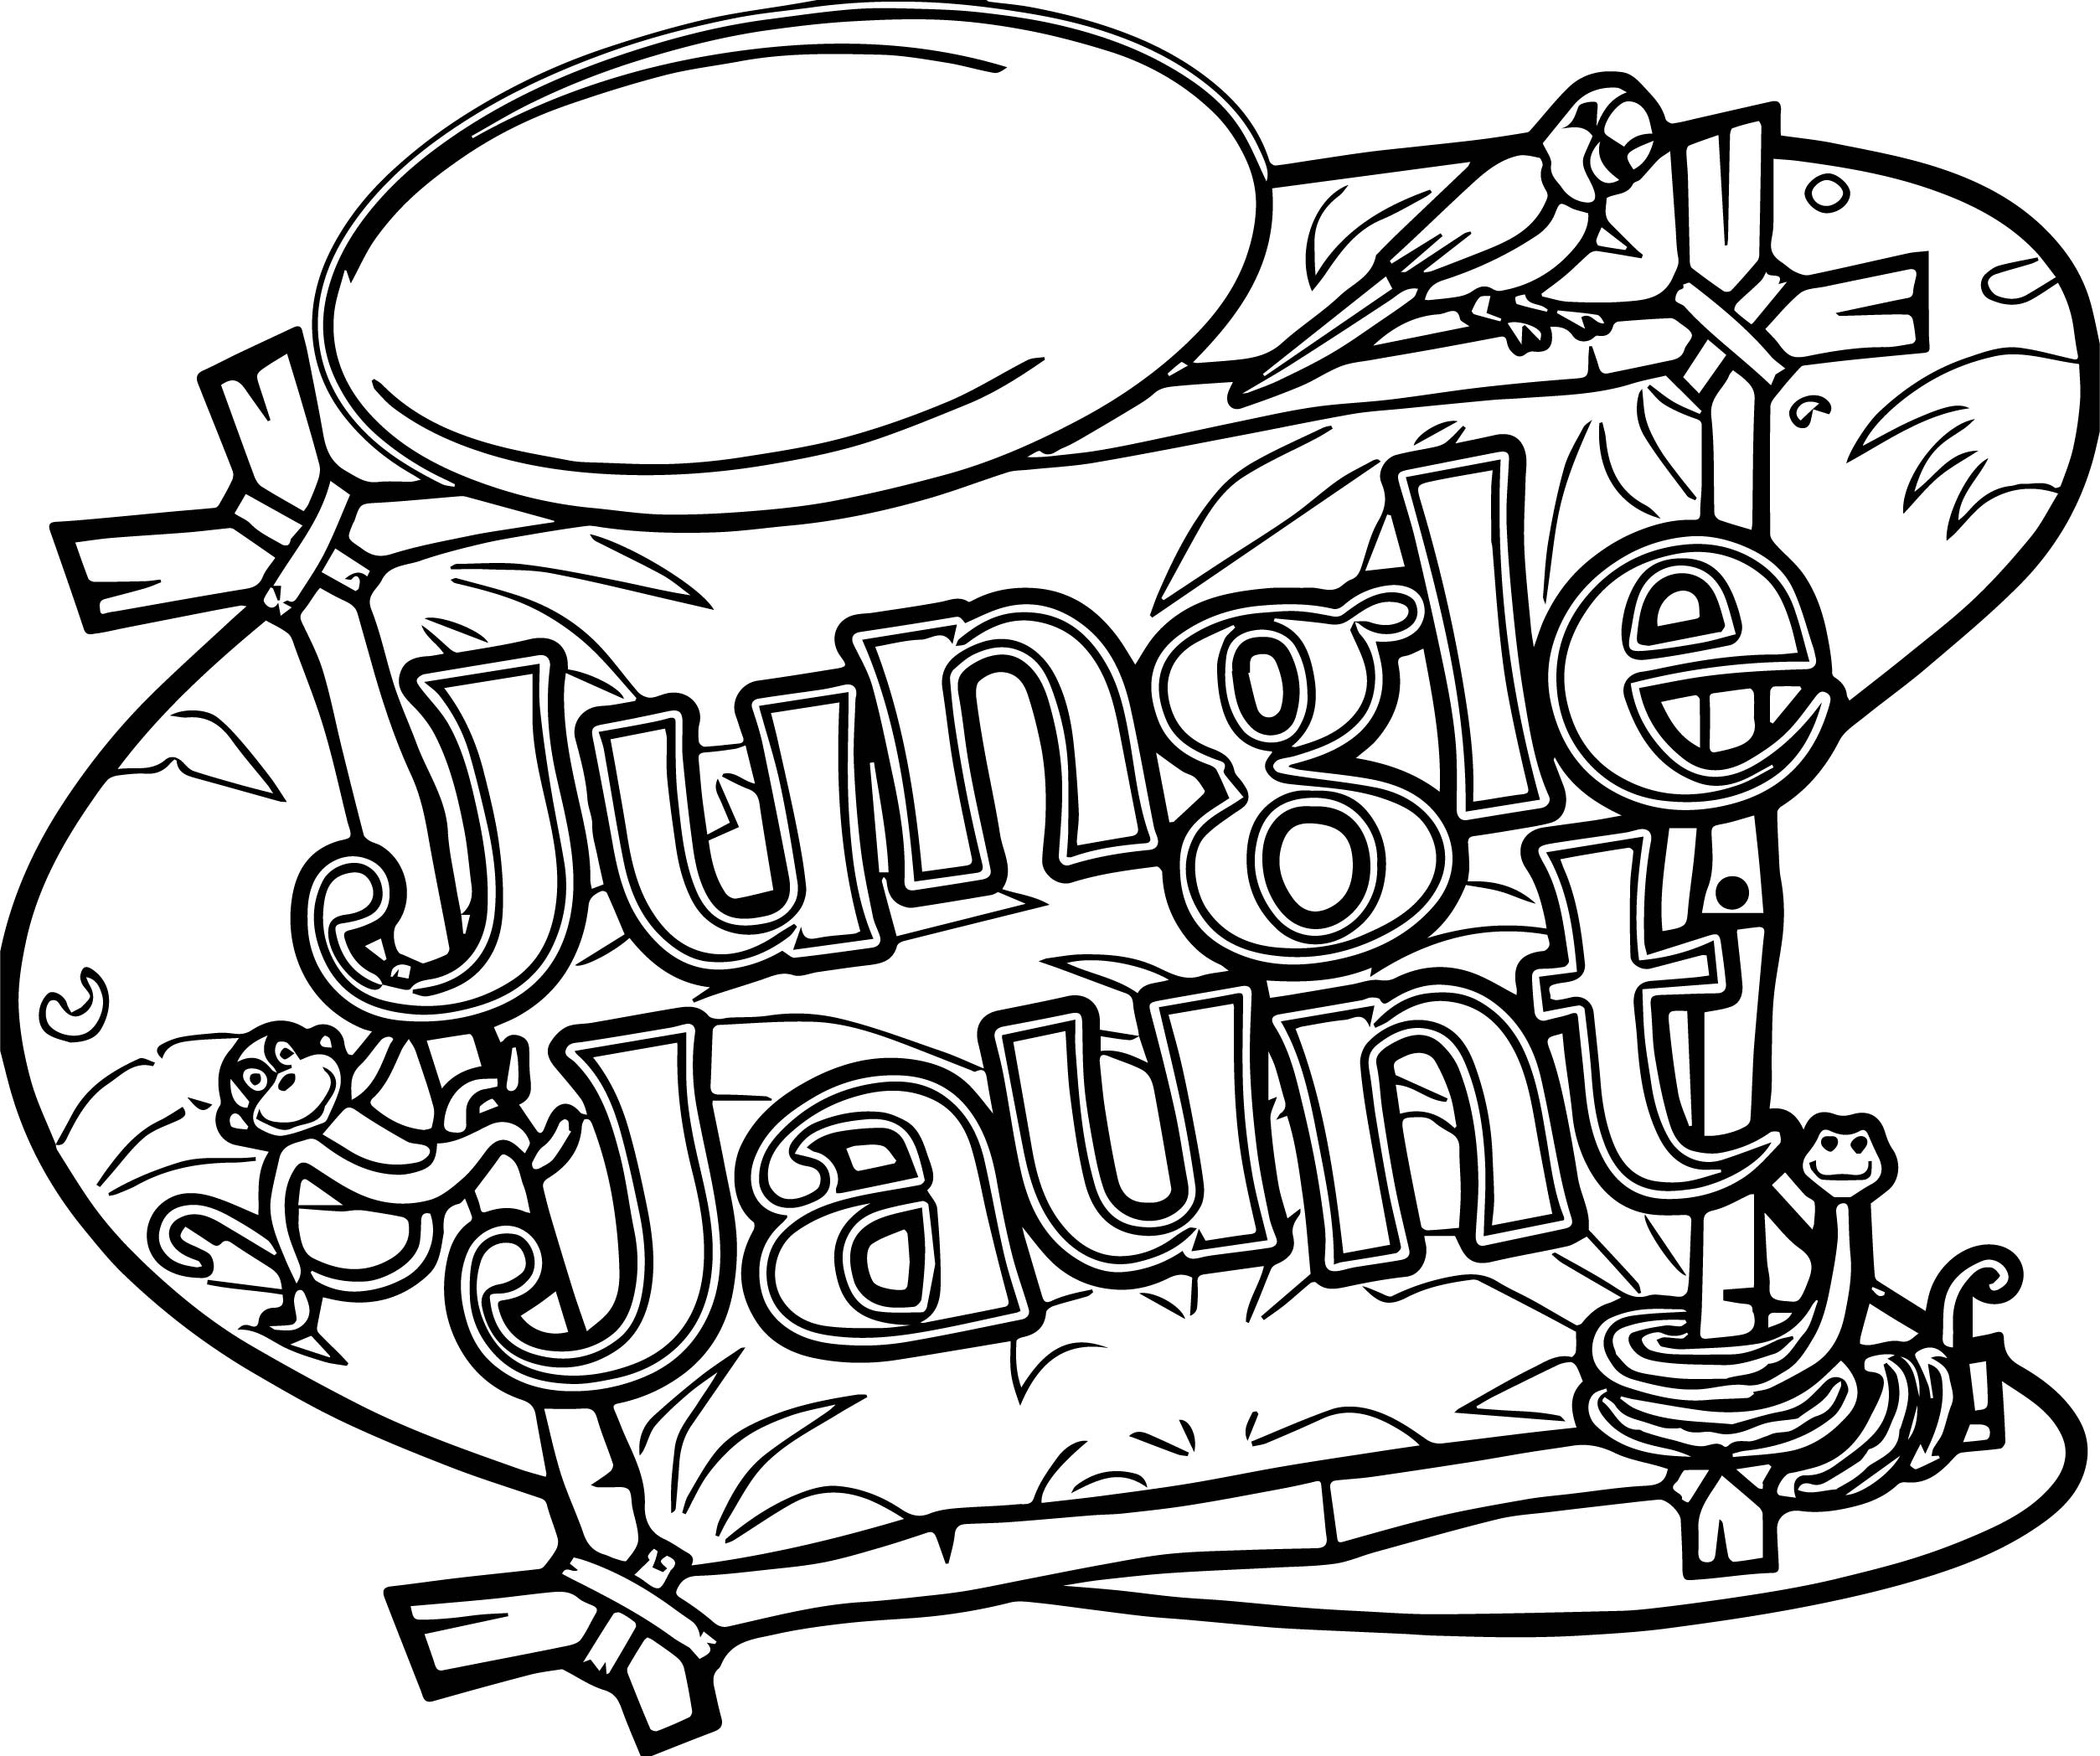 jungle jaunt coloring pages - photo#1